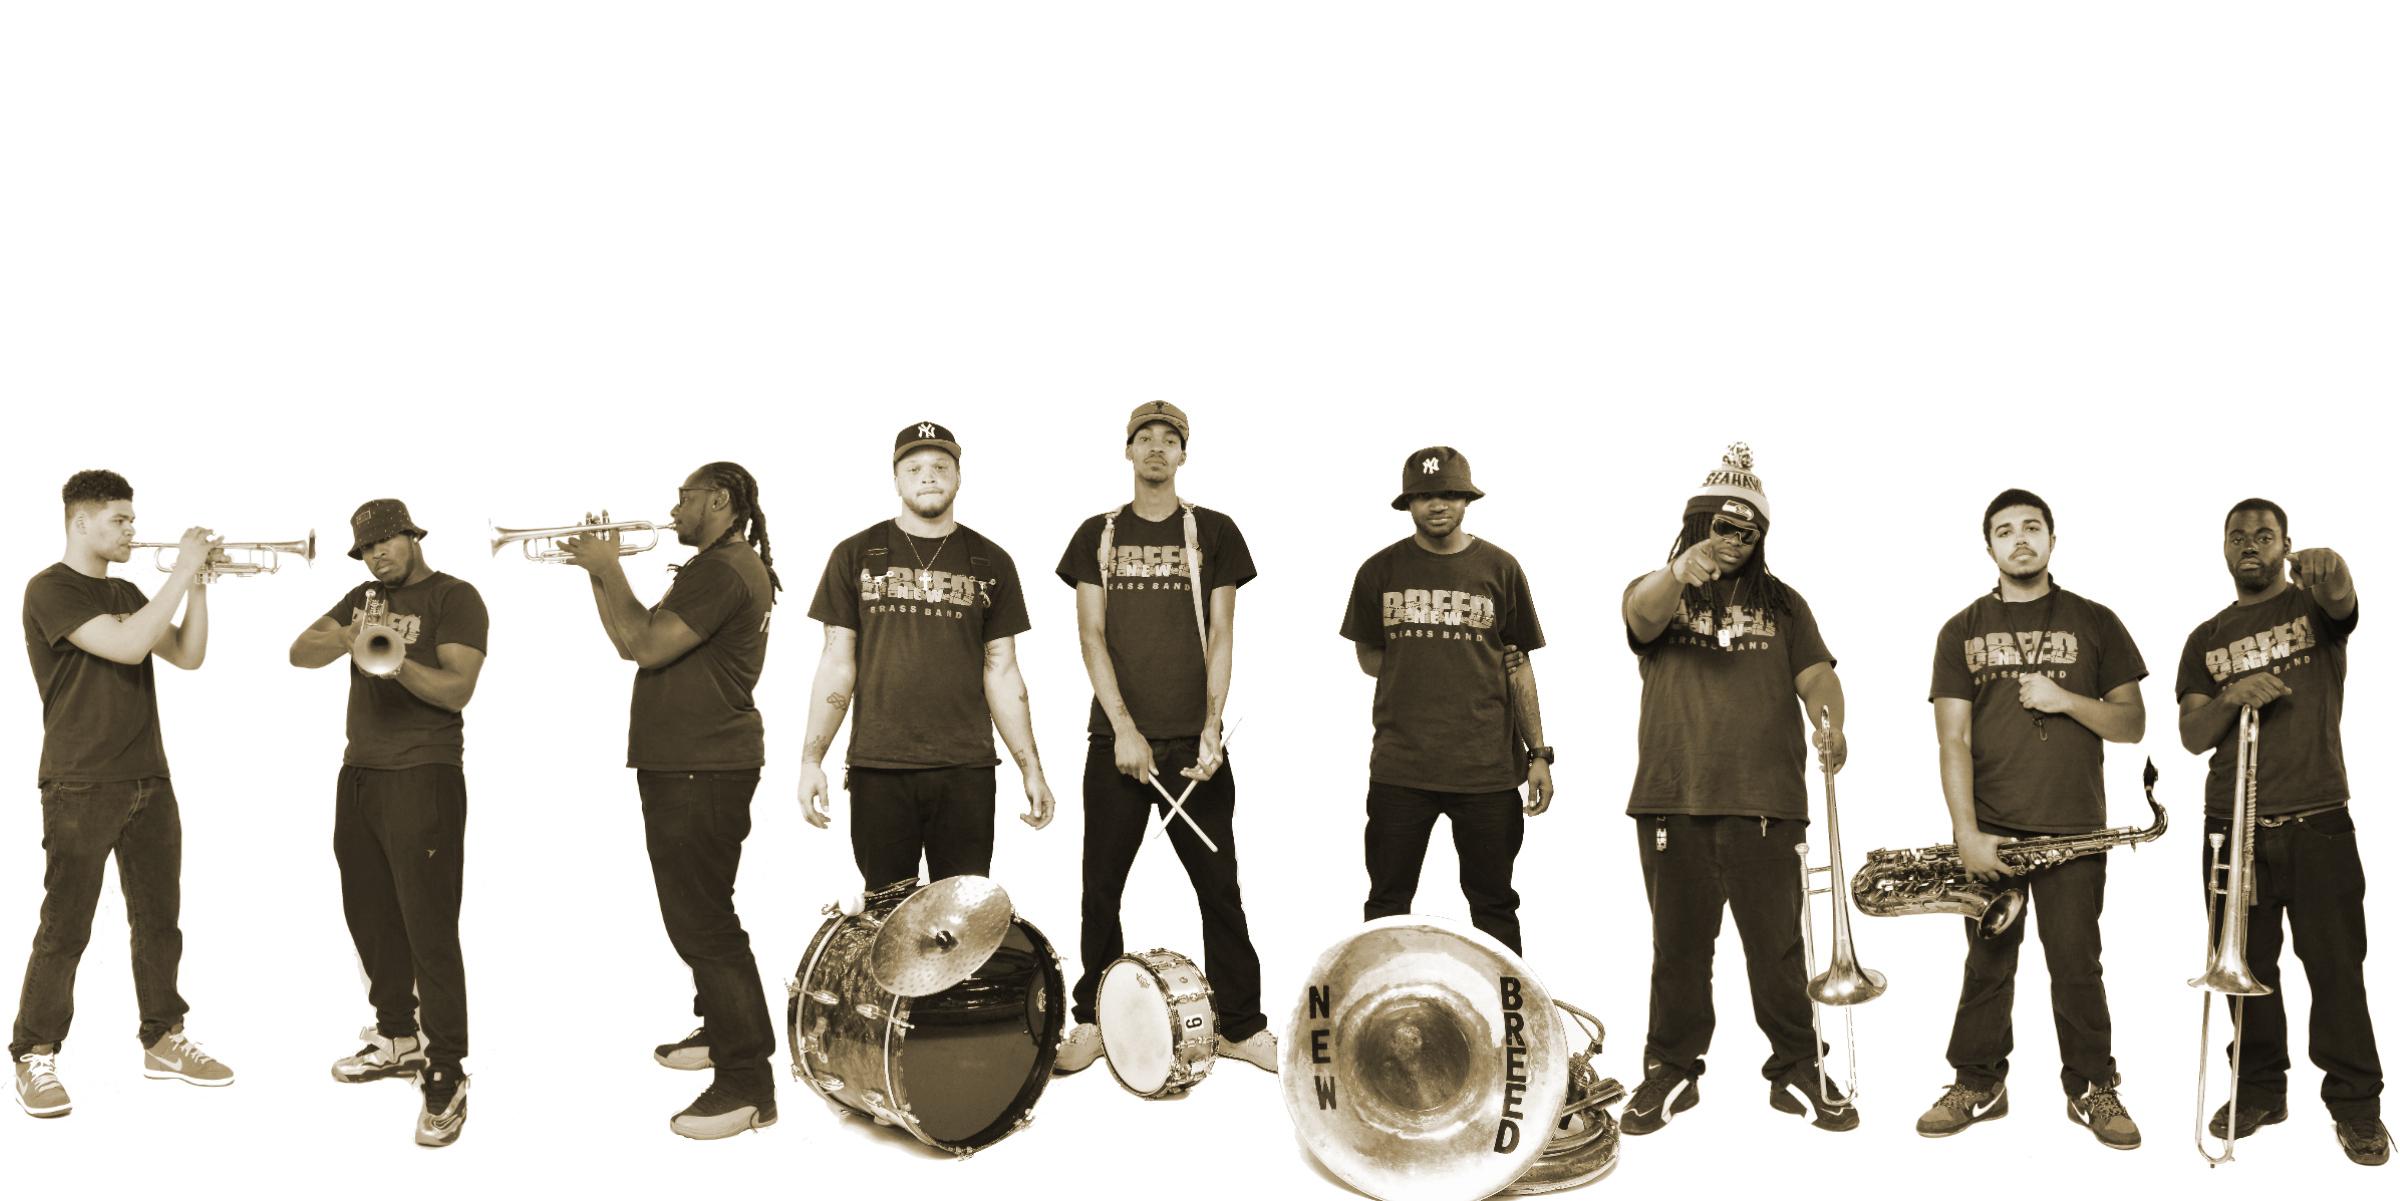 New-Breed-Brass-Band-5_sepia.jpg